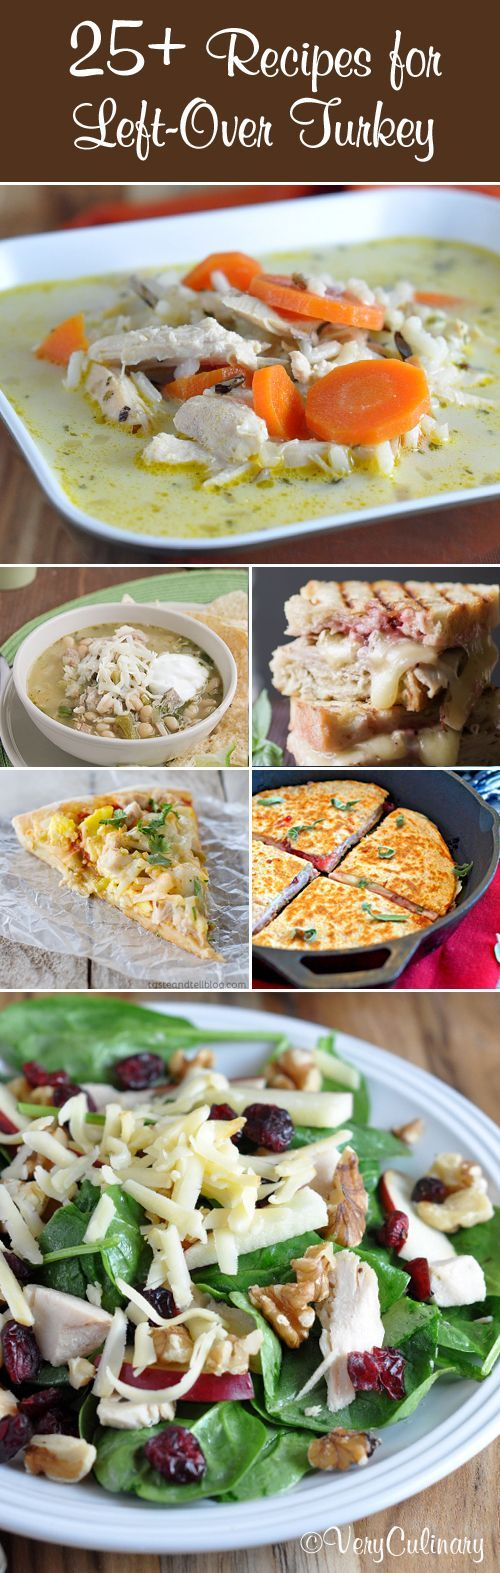 25+ Recipes Using Left Over Thanksgiving Turkey #thanksgiving #turkey #leftovers